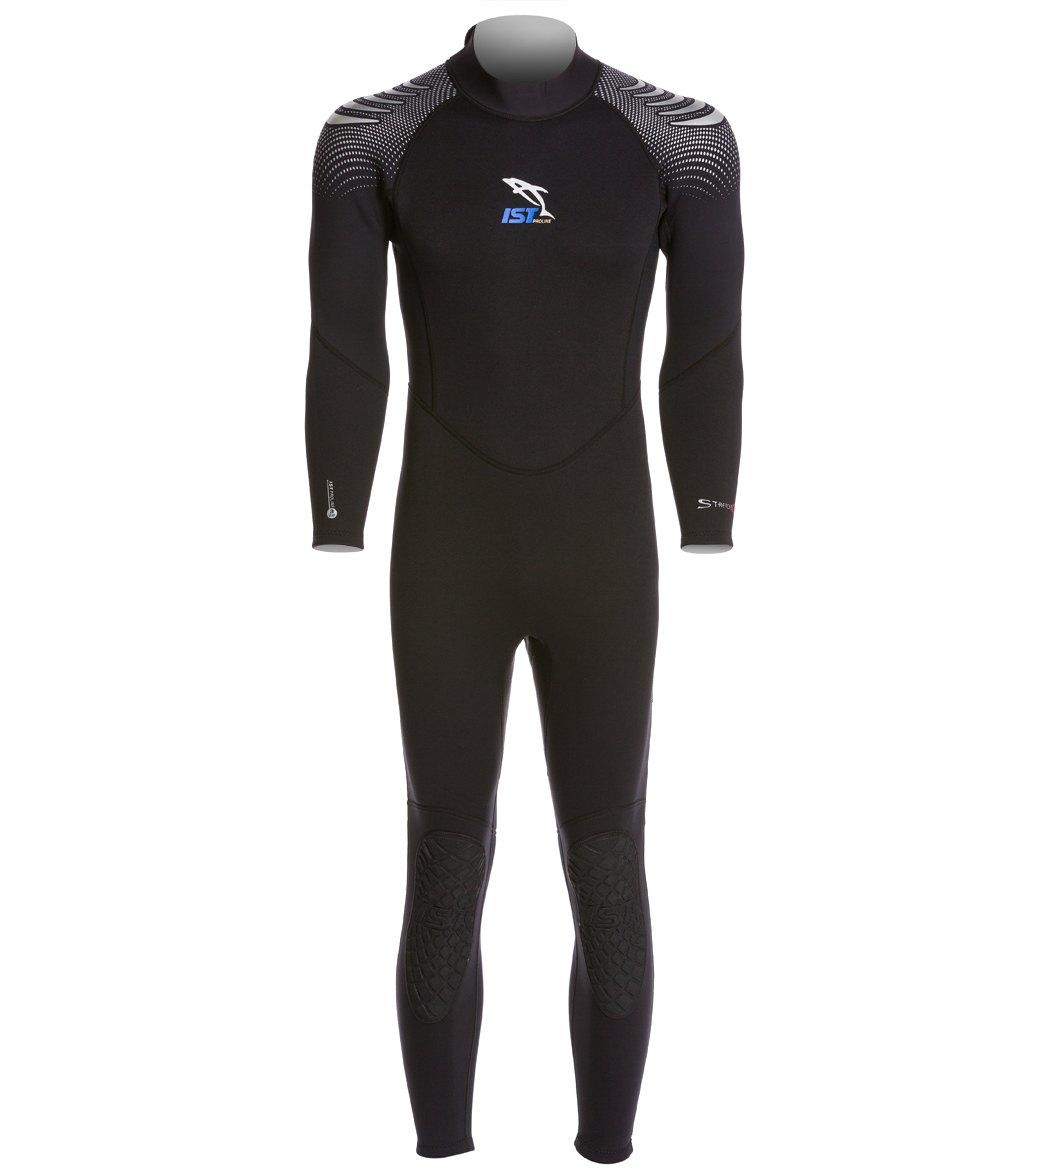 IST Wetsuits